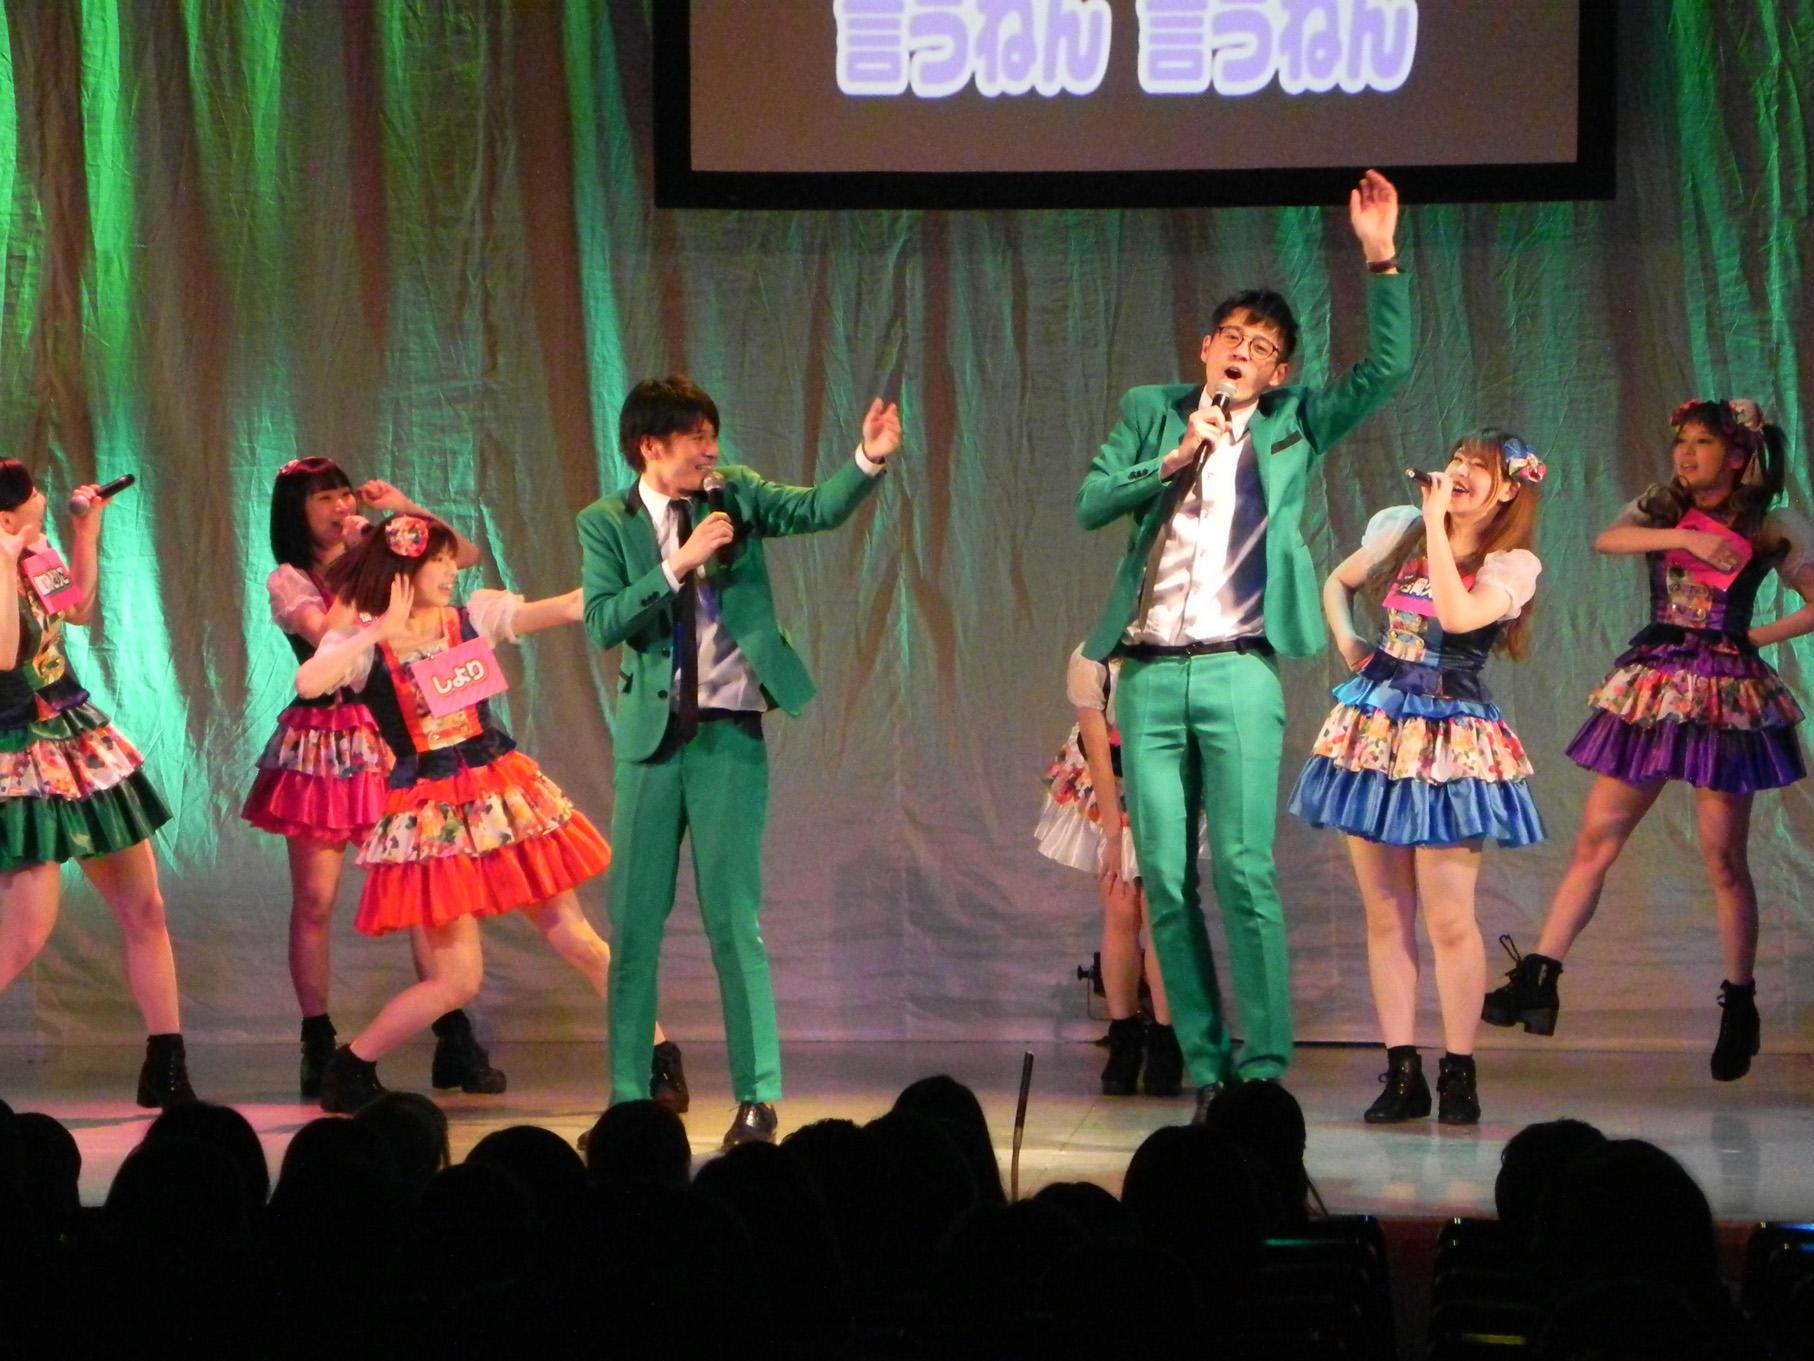 http://news.yoshimoto.co.jp/20170505192507-066c2bffe420a224f2431f634186970c54e8a587.jpg